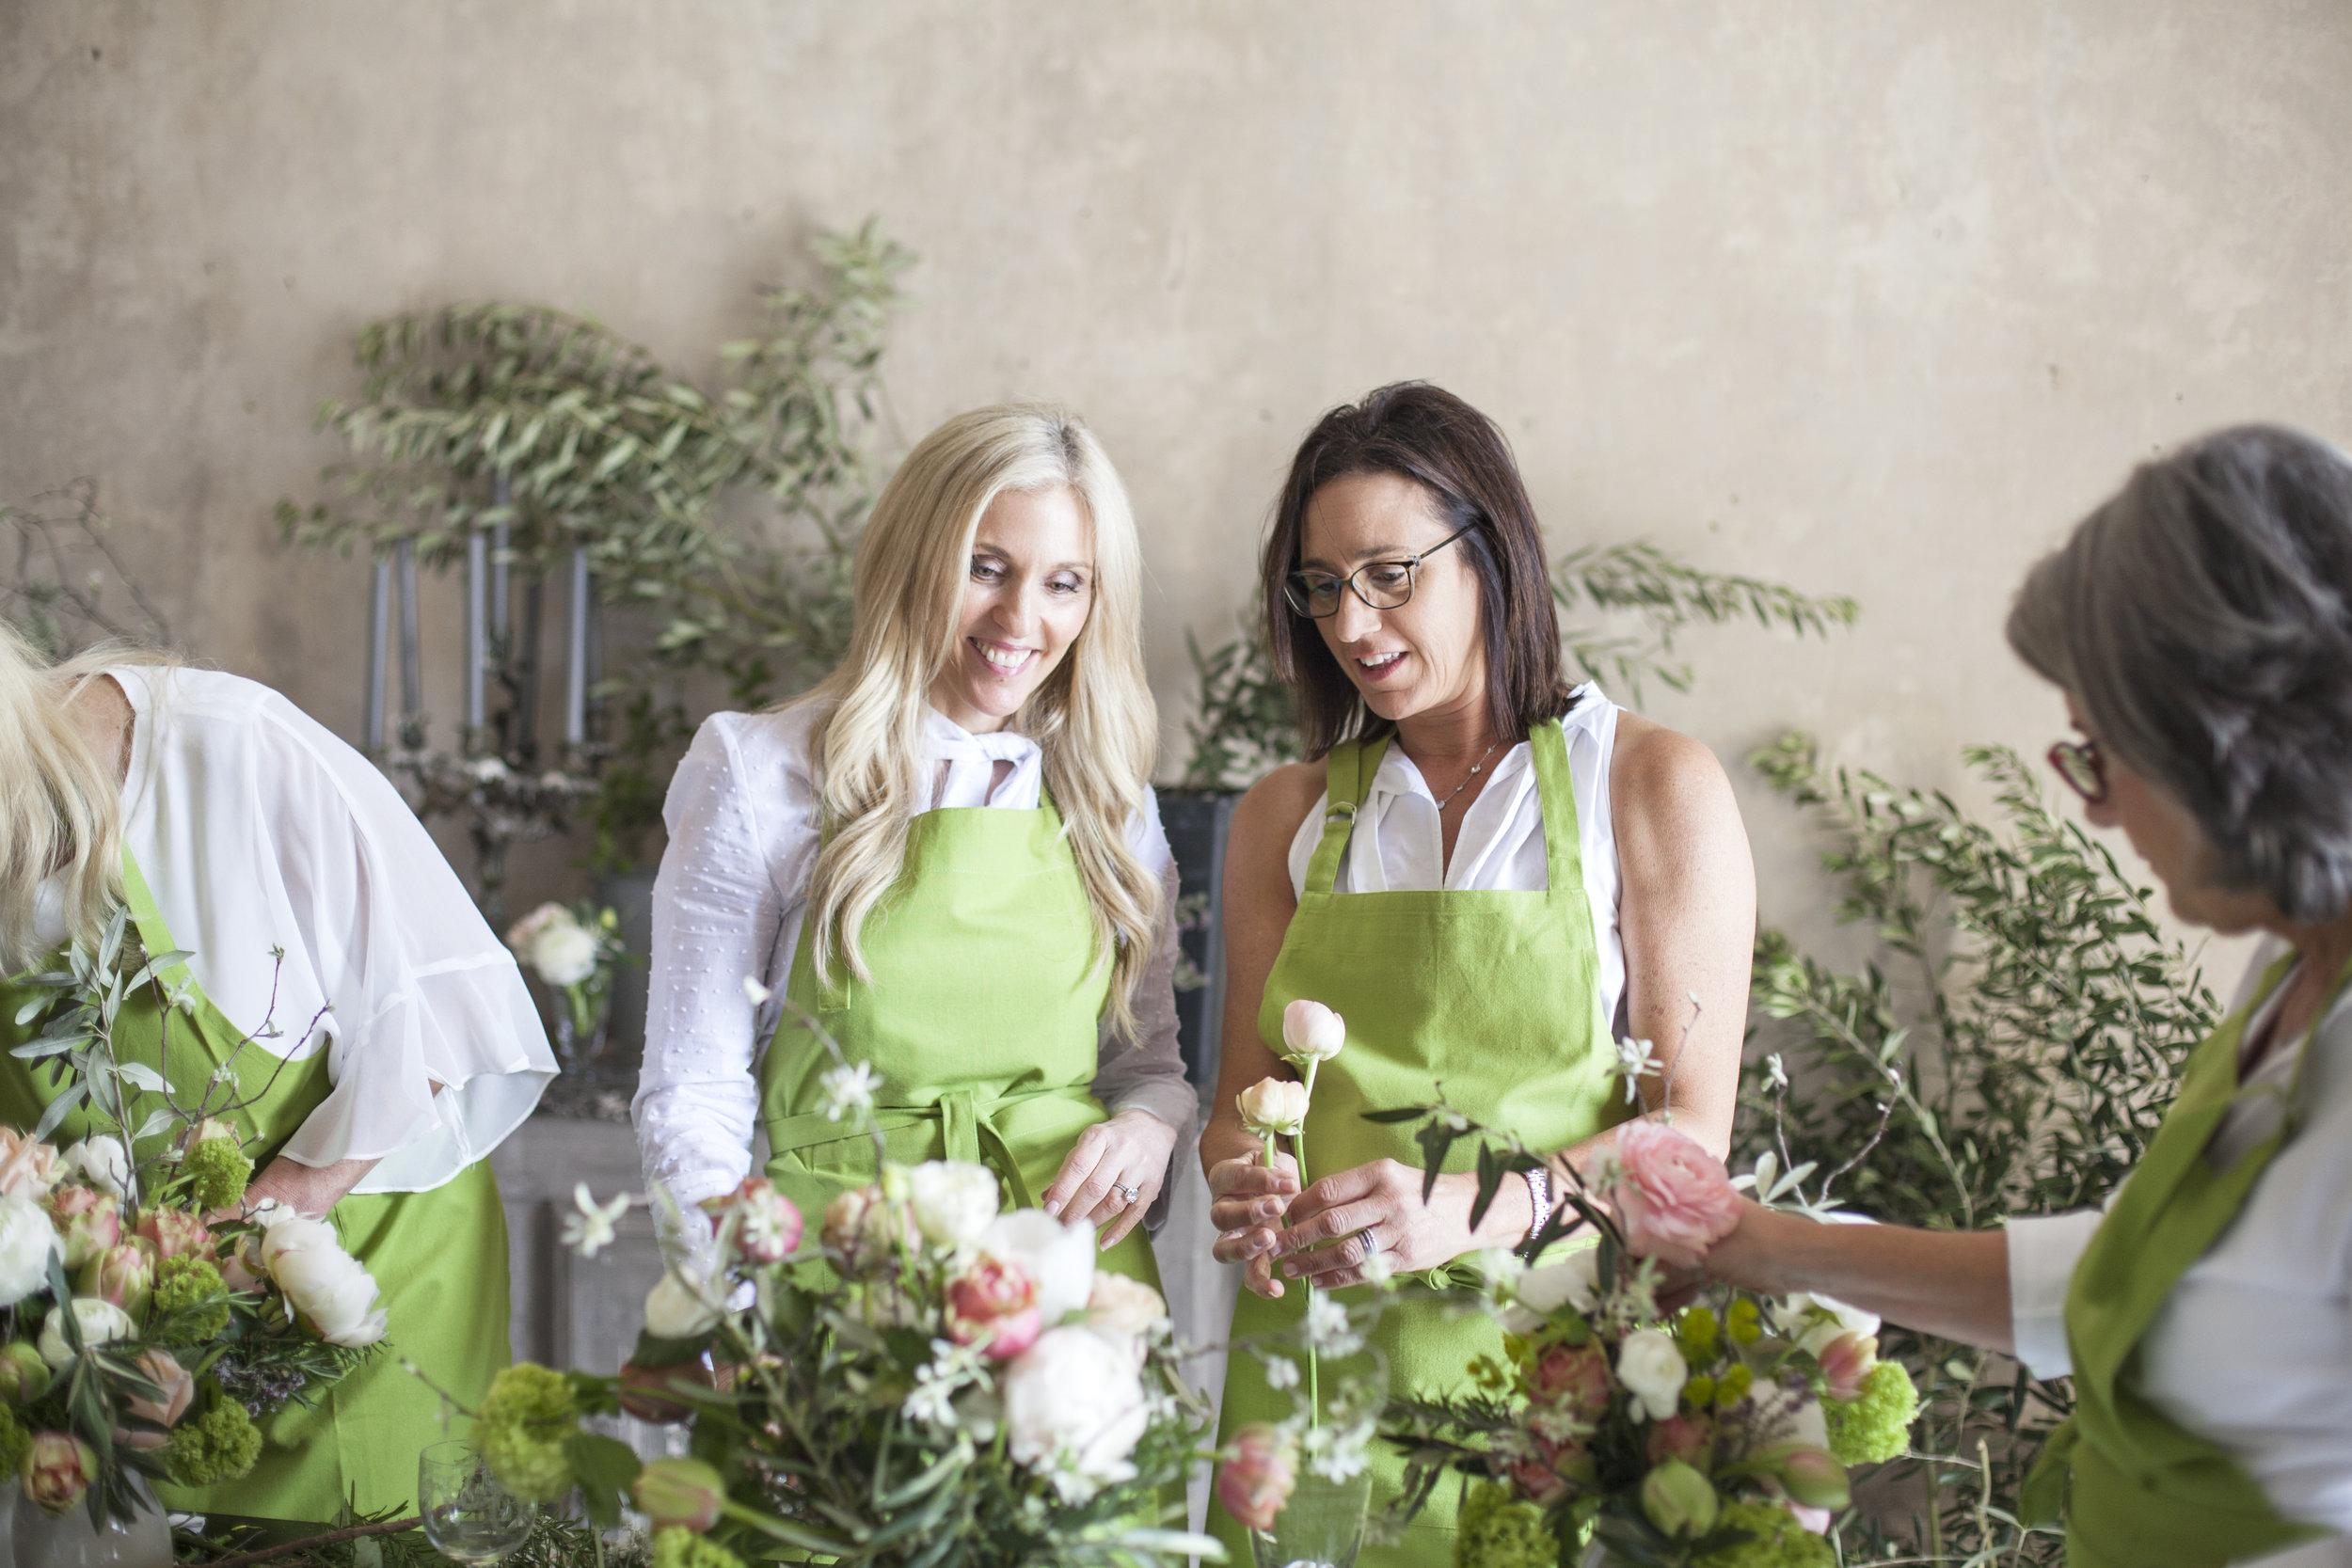 sandra sigman floral design class french chateau workshop